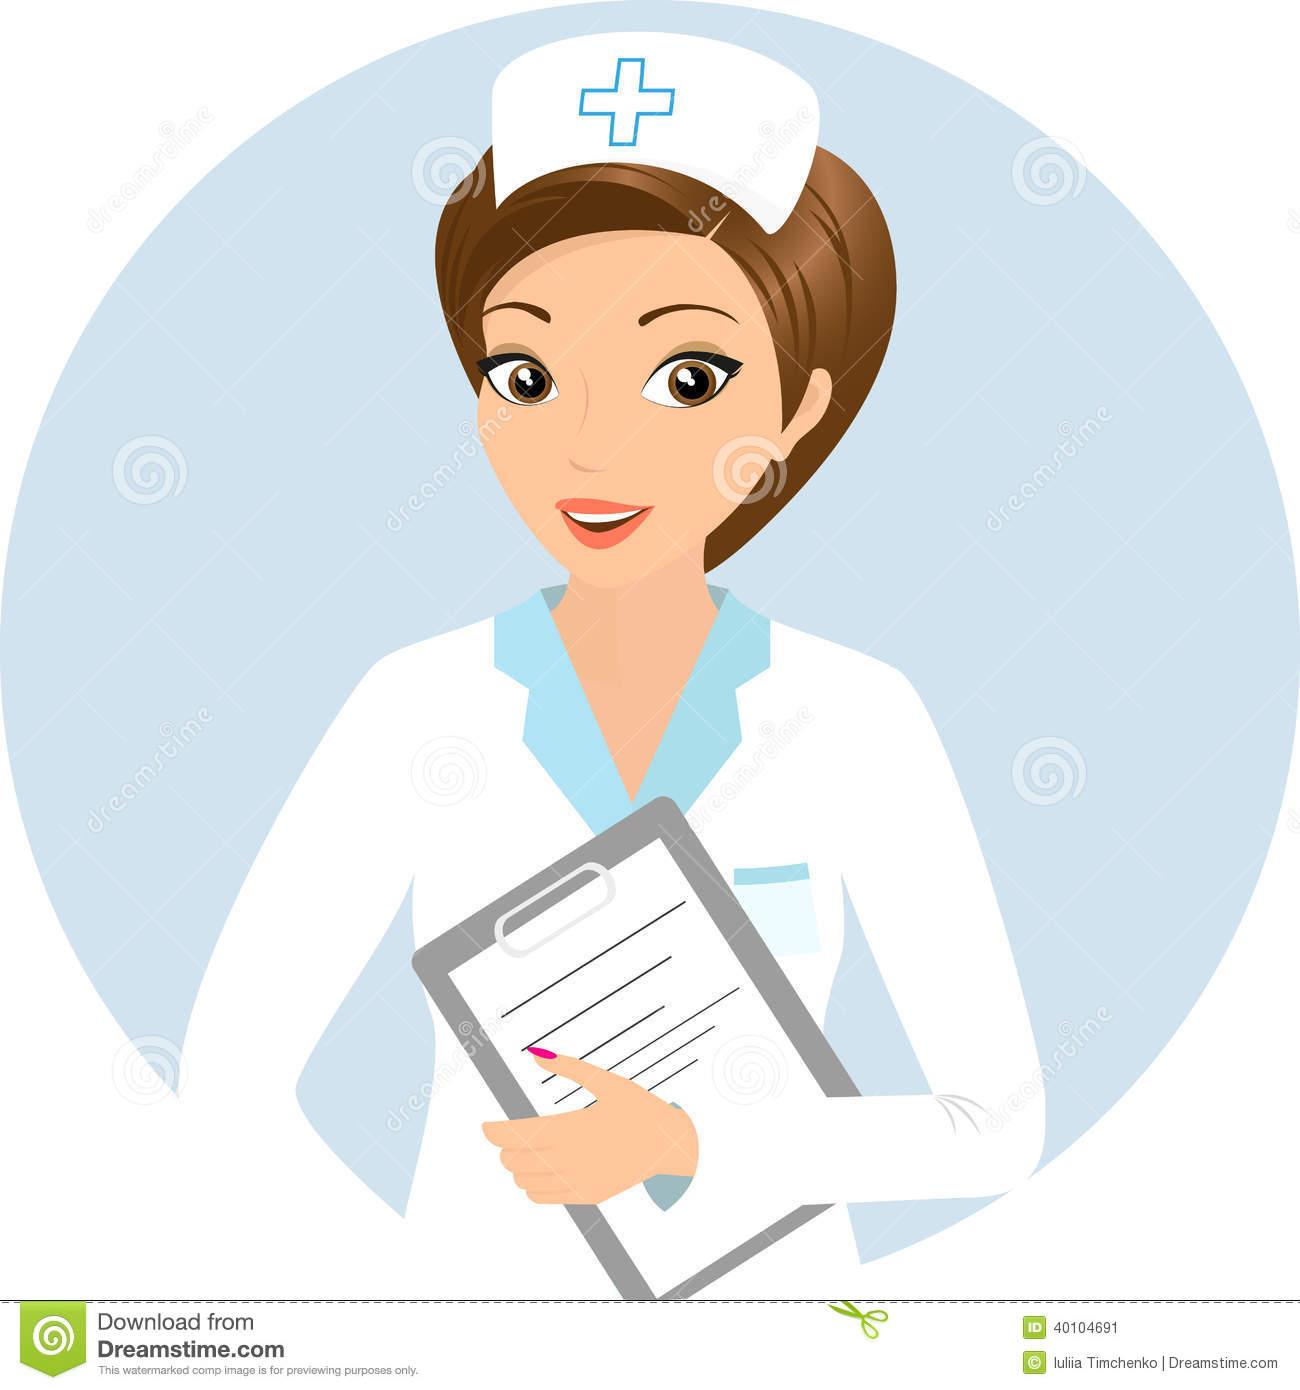 Staff clipart nursing staff Smiling Nurse Nurse Clipart cliparts